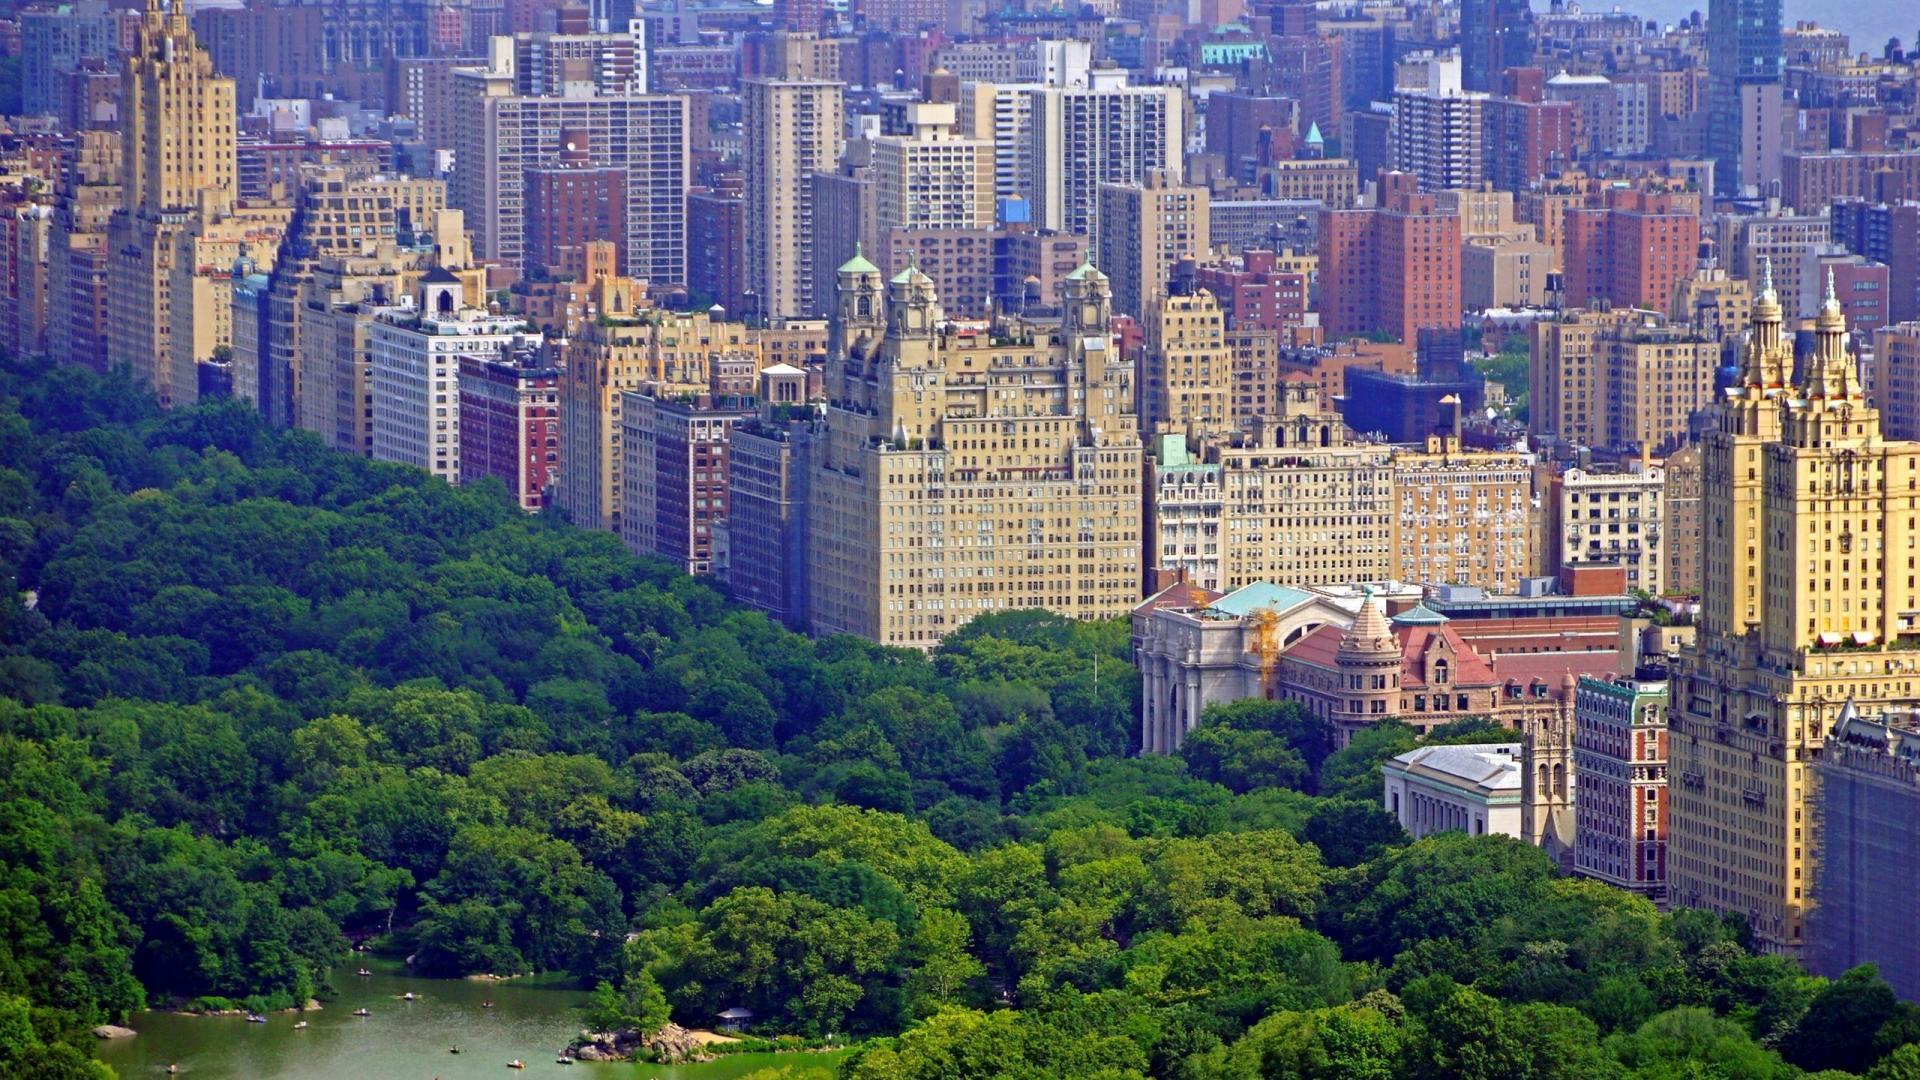 New York Central Park Wallpaper New York City Central Park